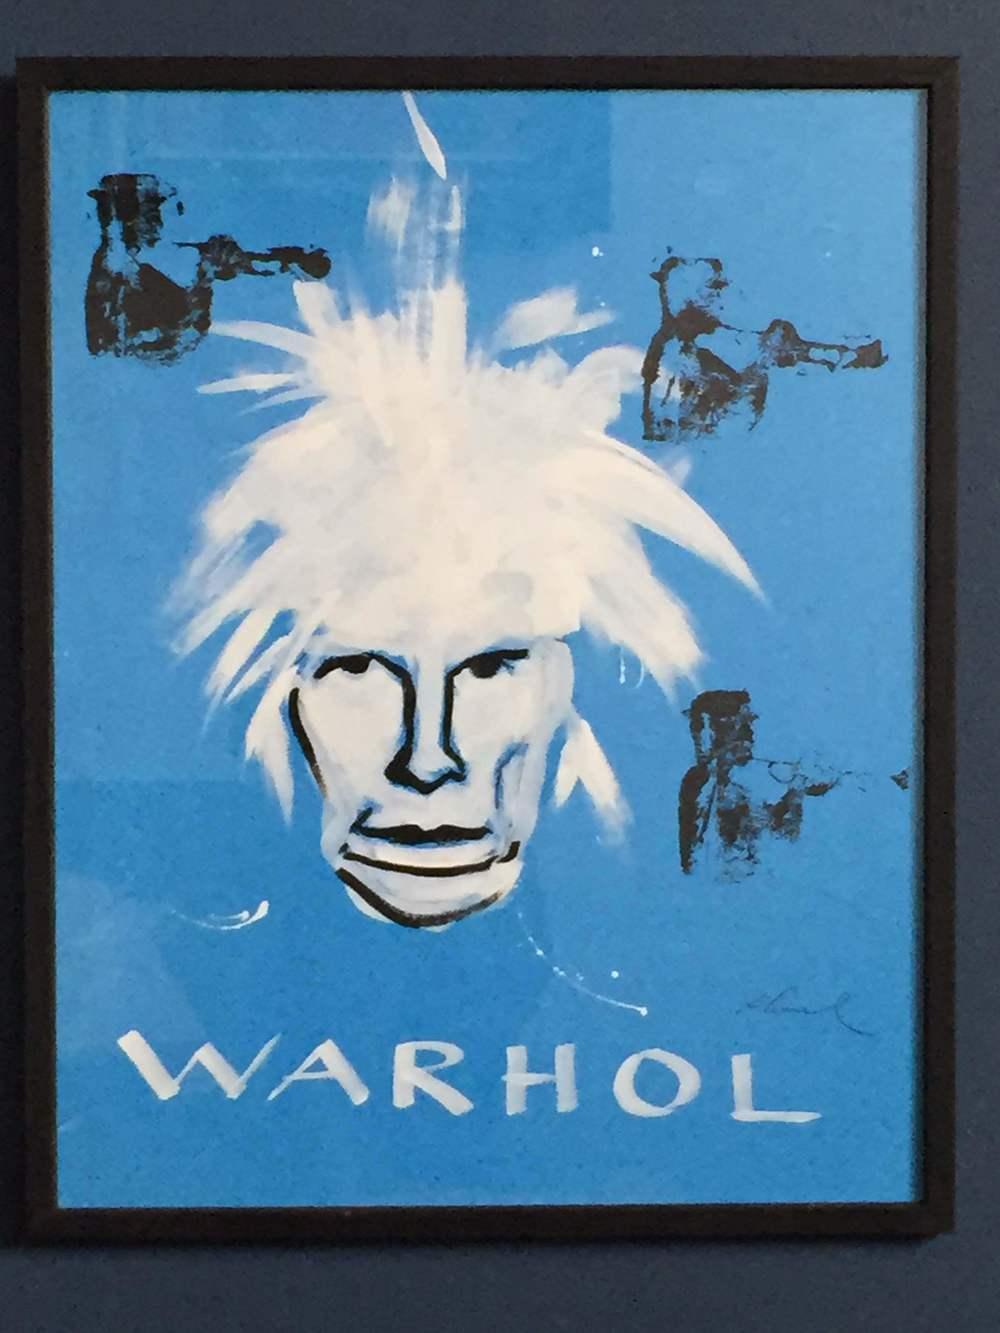 Warhol Meets Rhonel